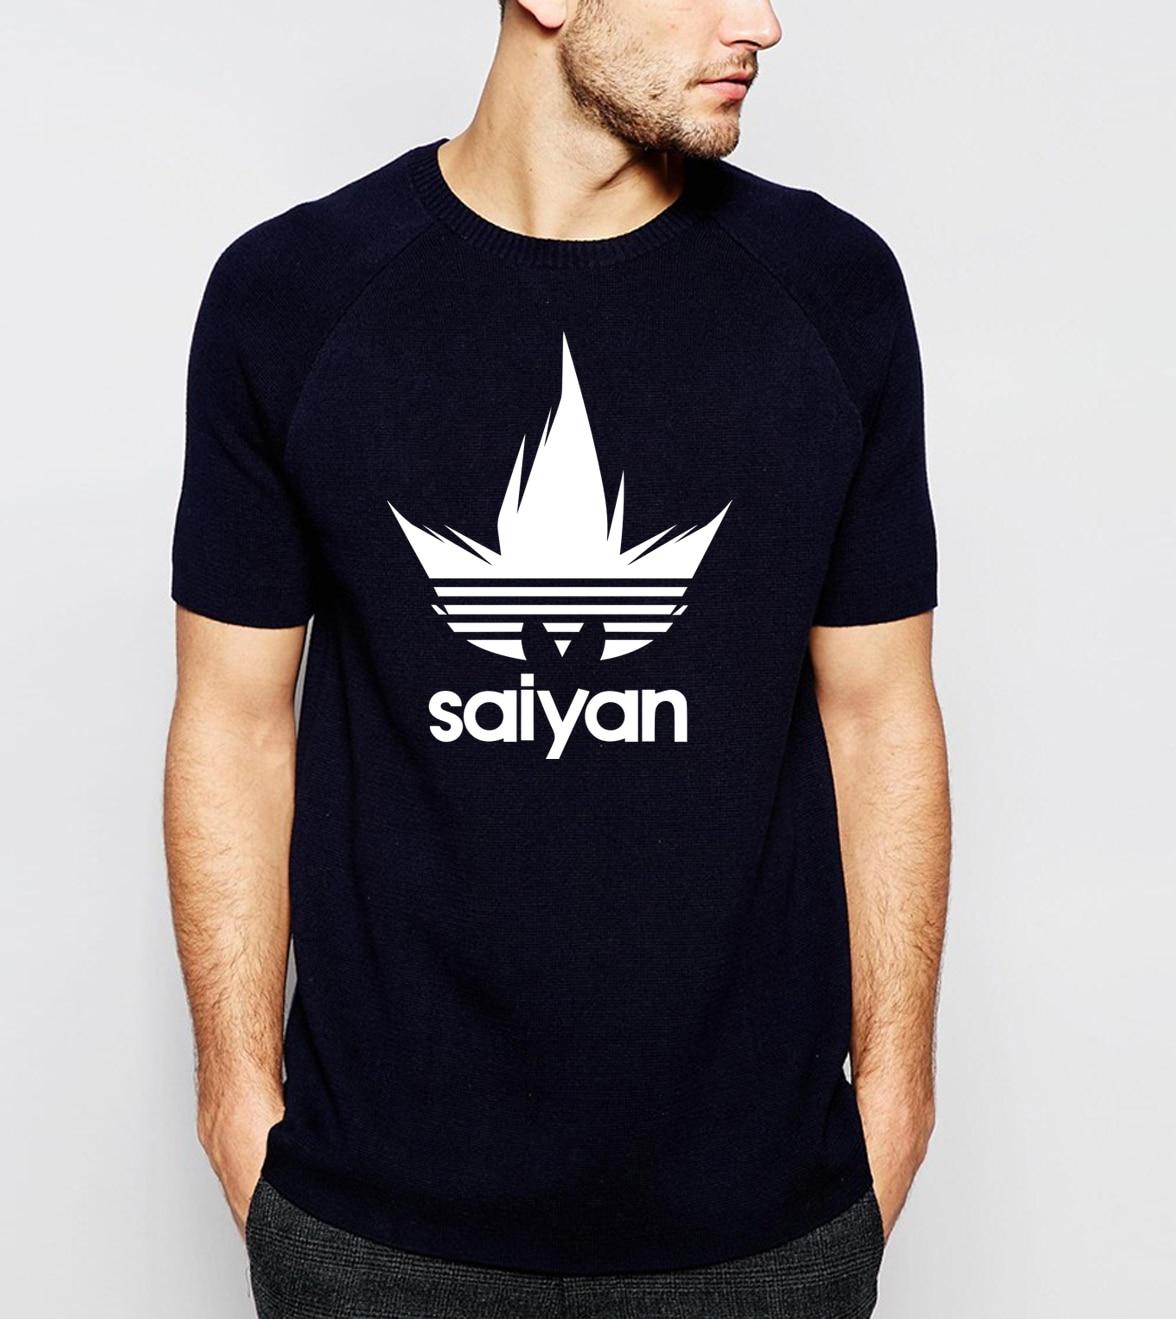 Super Saiyan Anime Dragon Ball Z Men T-Shirts 2019 Summer Round Neck 100% Cotton Tshirt Men's Harajuku Camisetas Hombre For Fans